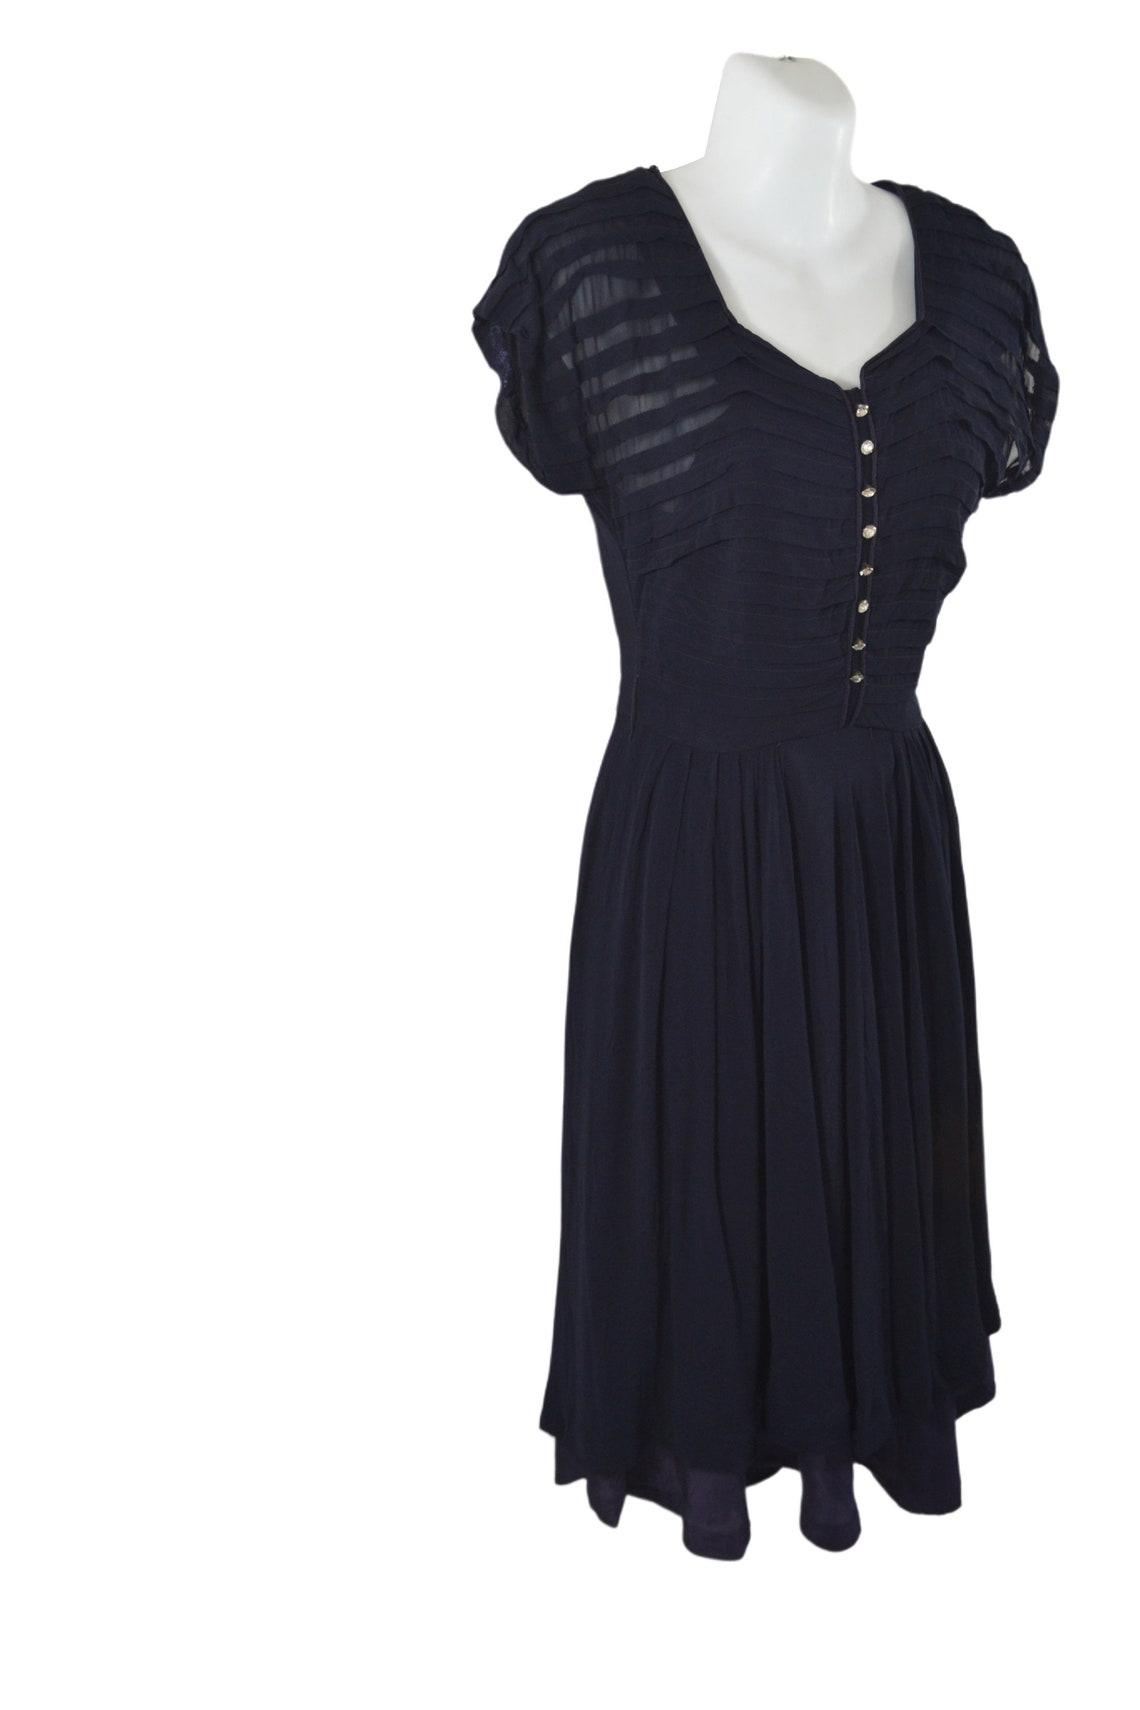 1950s Dark Blue Sheer Gauzy Cocktail Party Dress Needs TLC